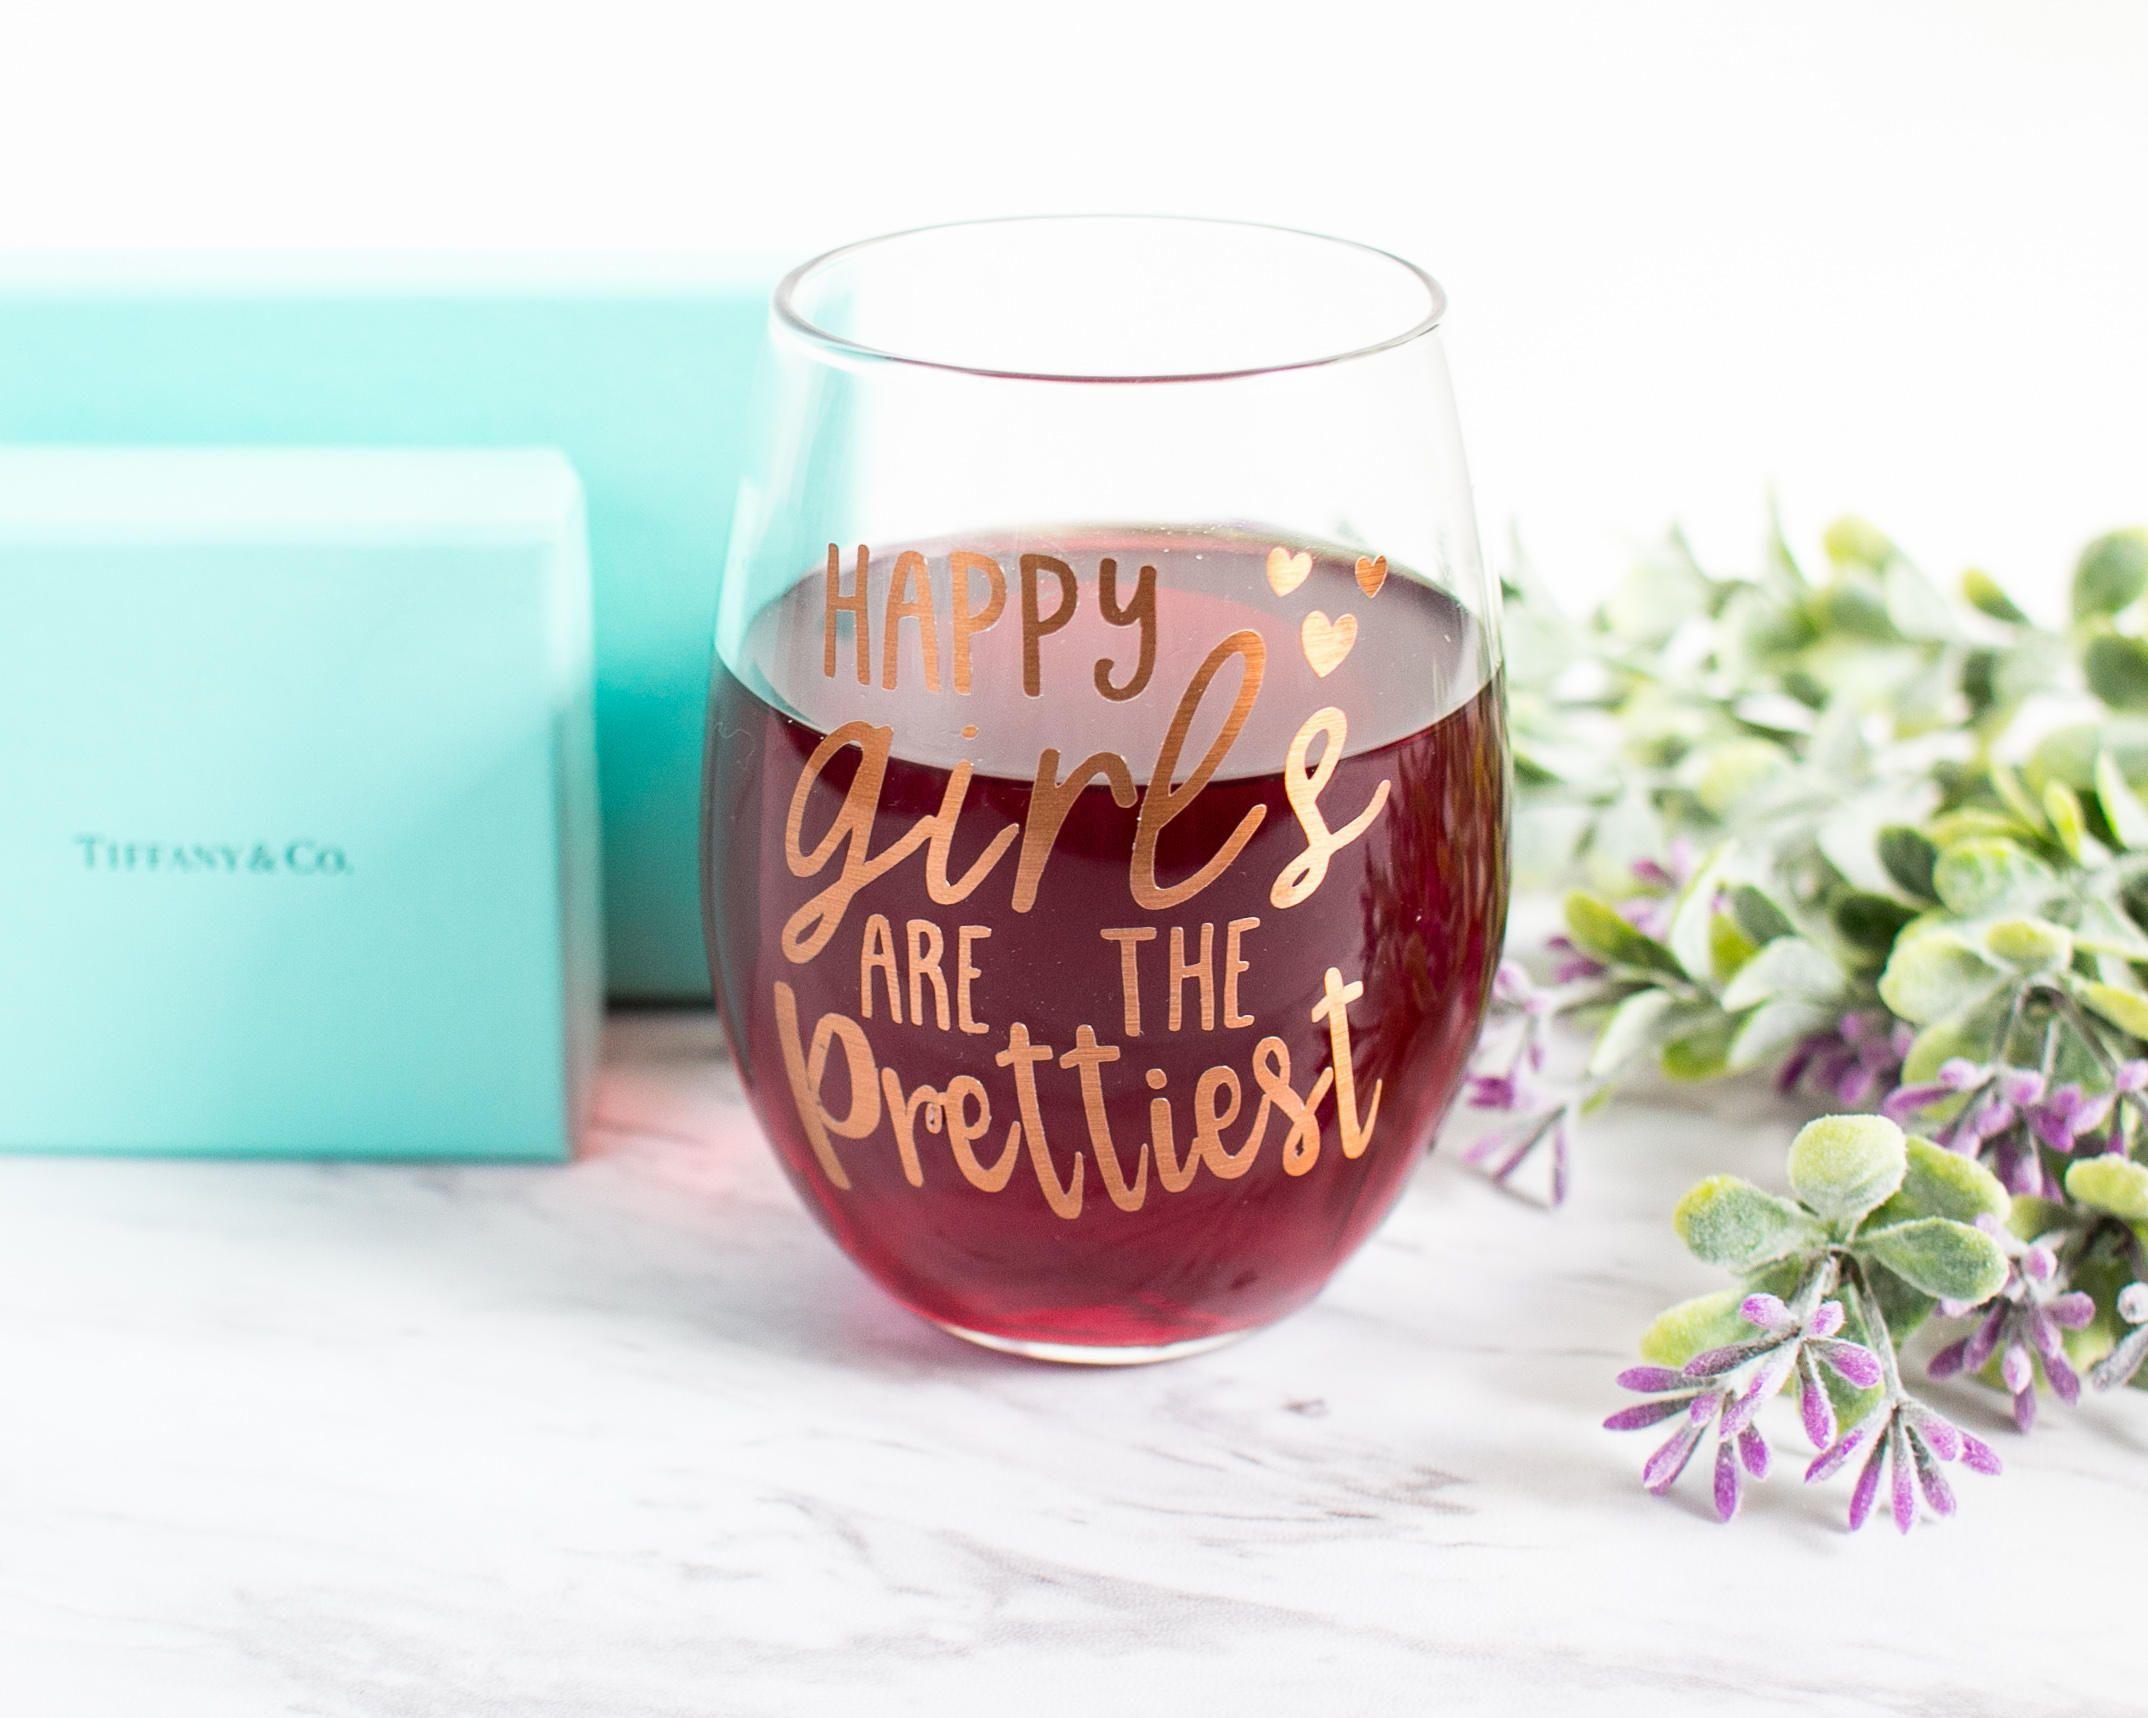 Happy Girls Are The Prettiest Audrey Hepburn Quote Pretty 15oz Wine Glass Cute Glass Drinkware Gifts Glass Gifts Personalized Wine Glass Girl Boss Gift